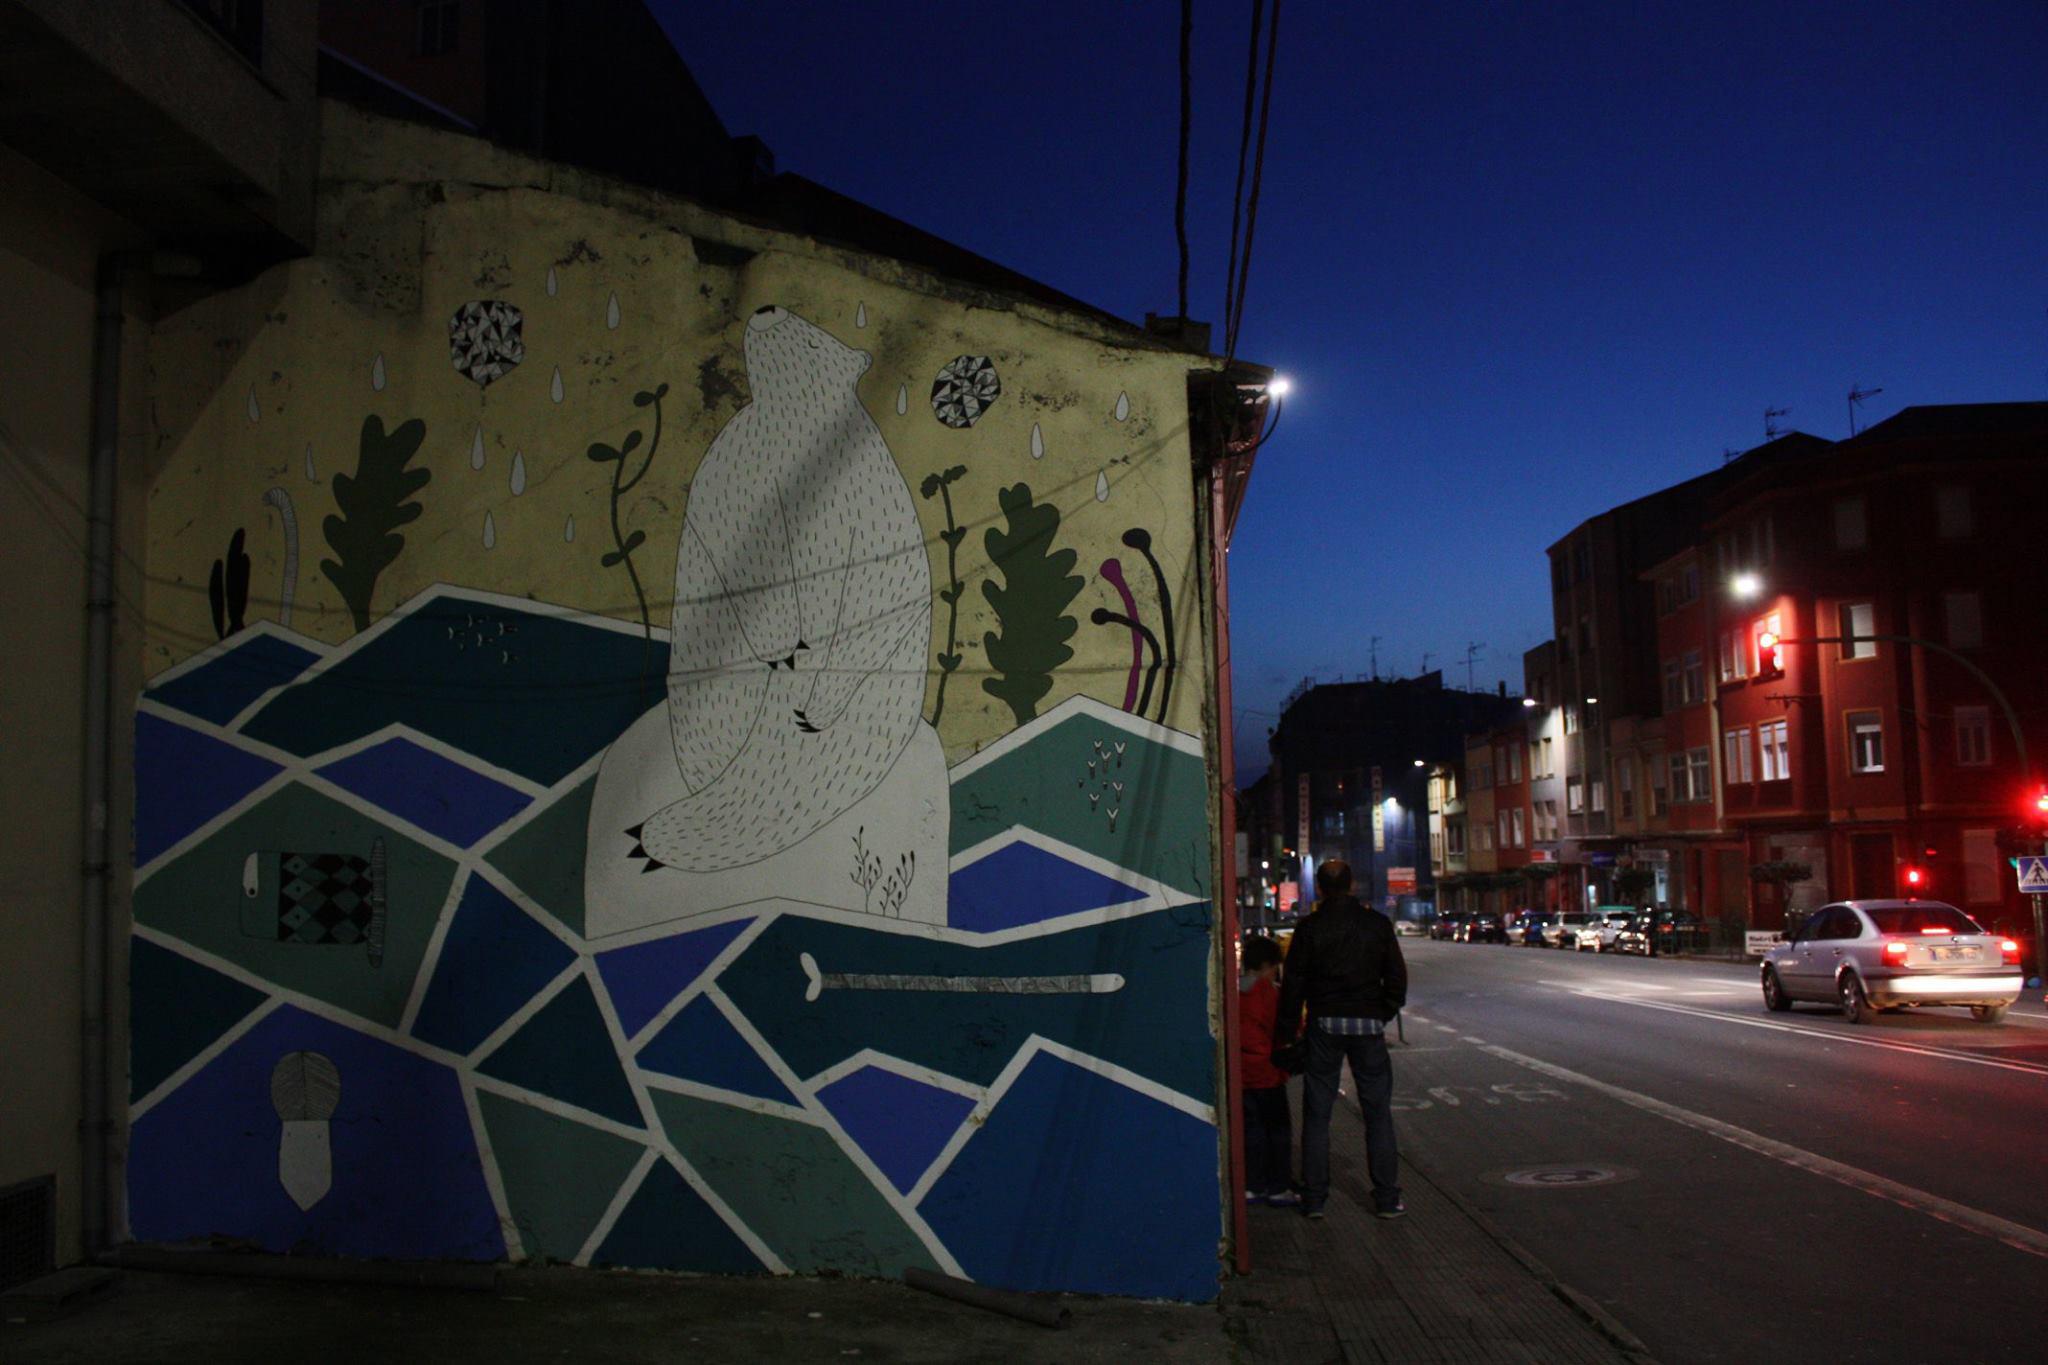 Foto principal mural Amañecer